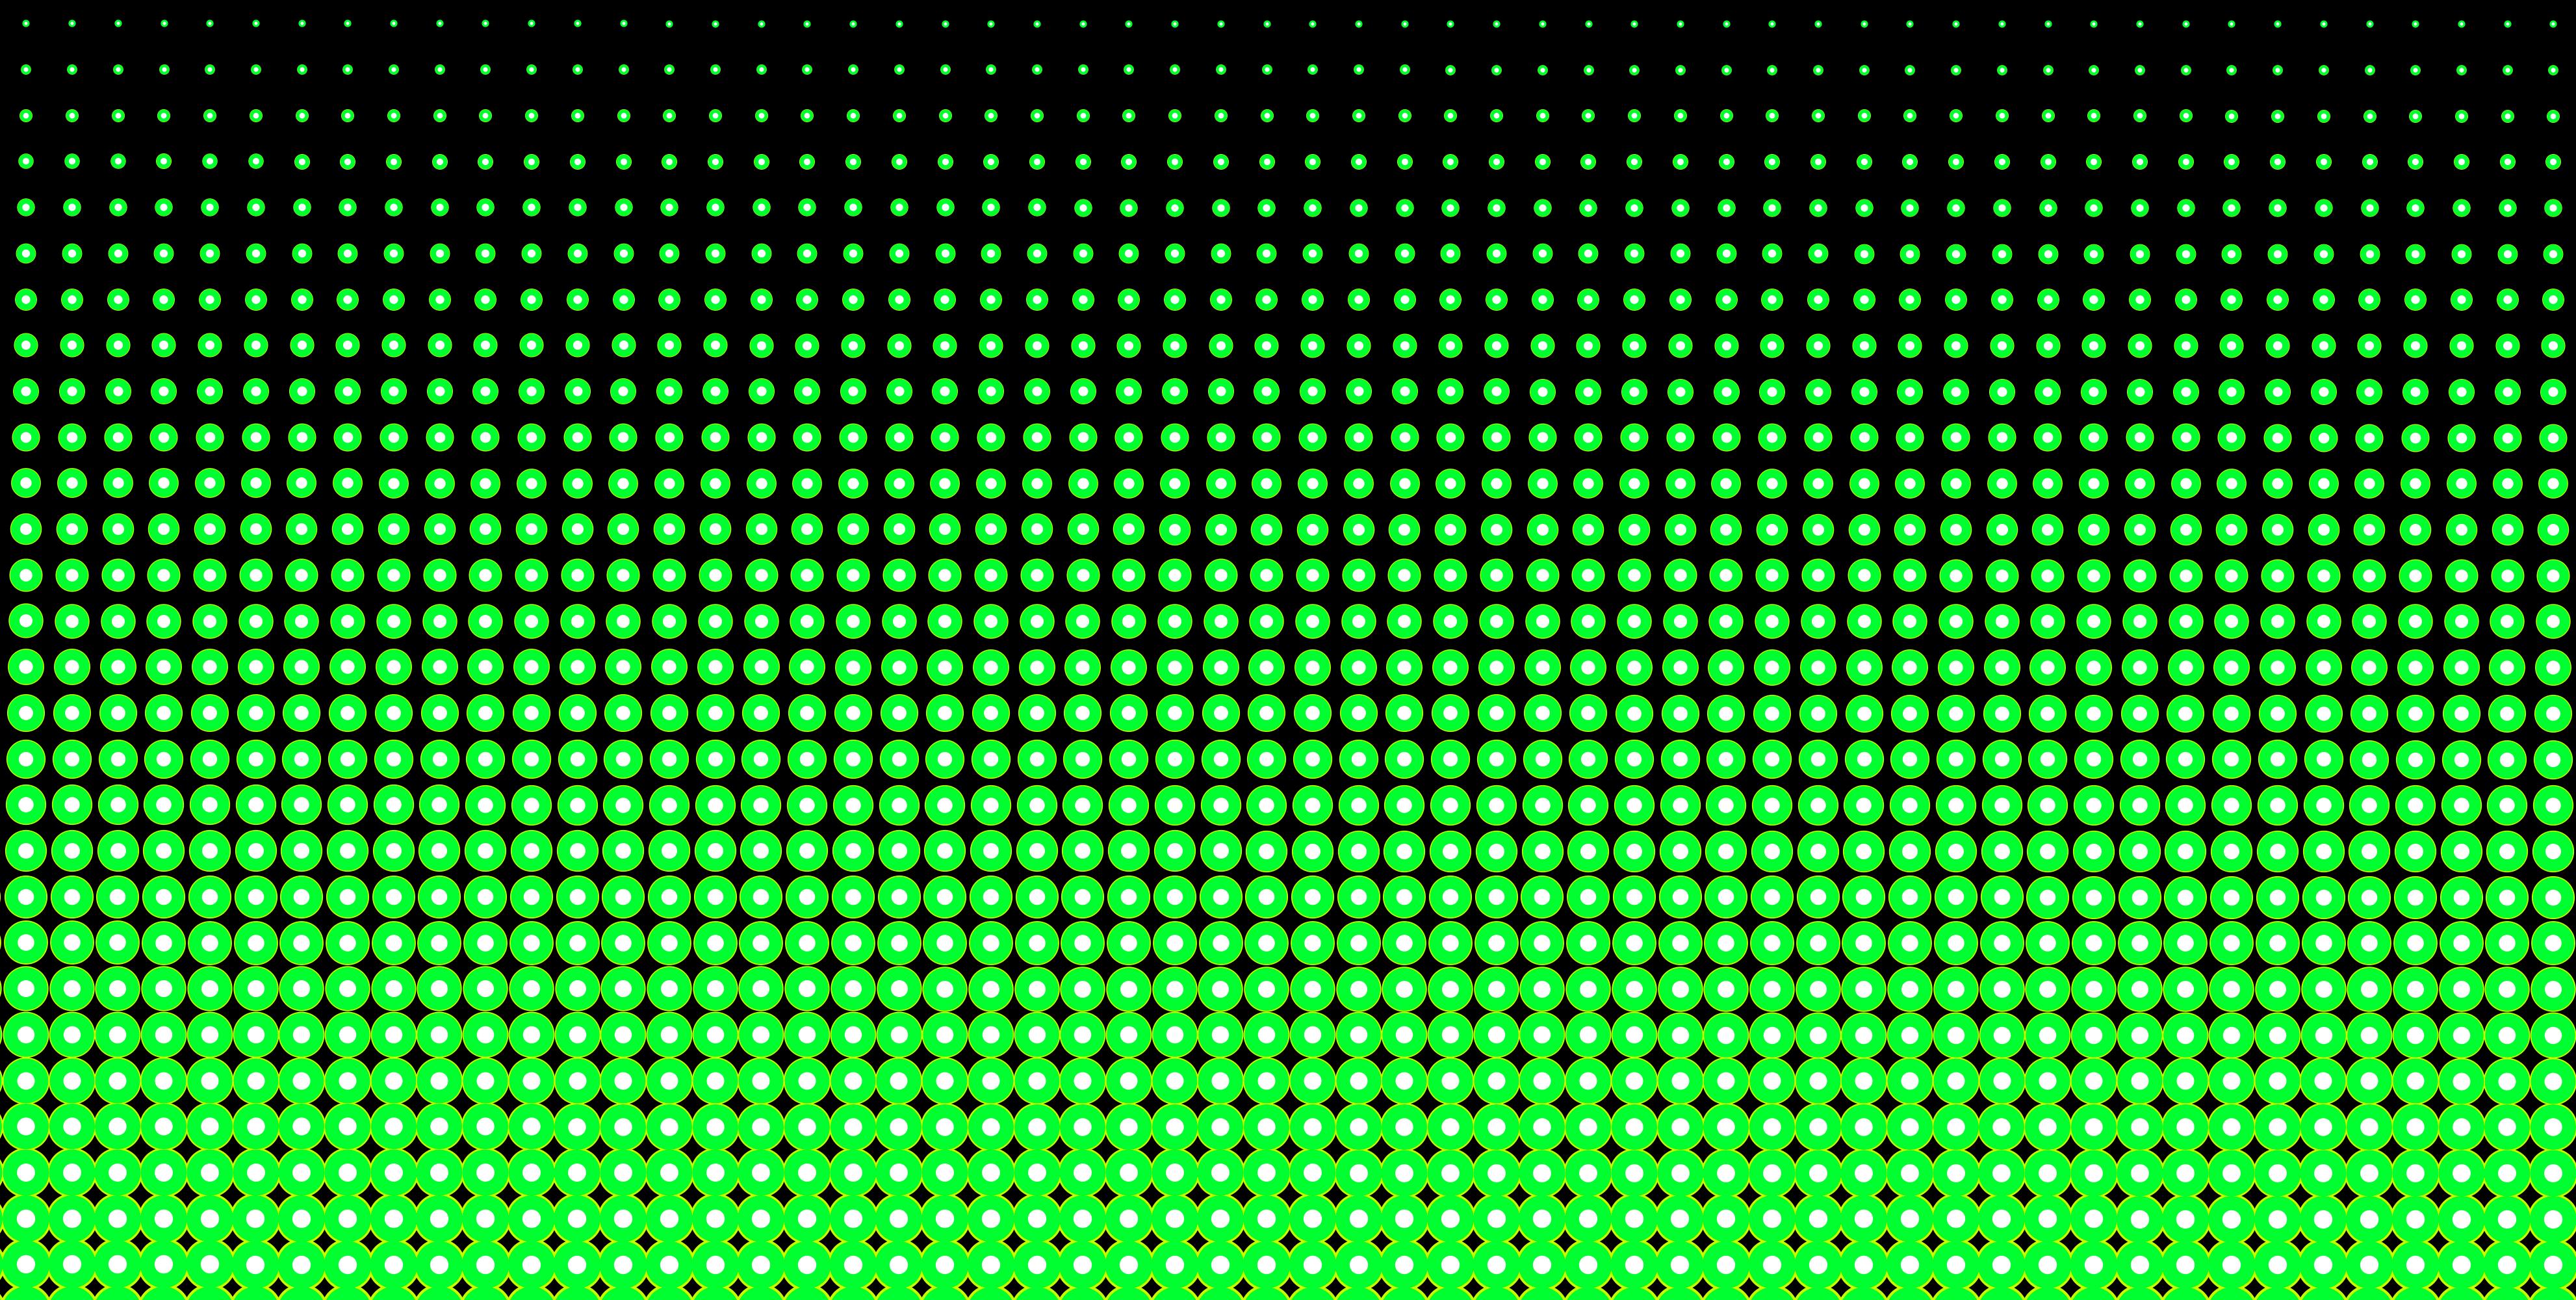 Neon Green and Black Halftone Pattern   Clip Art 3964x2000